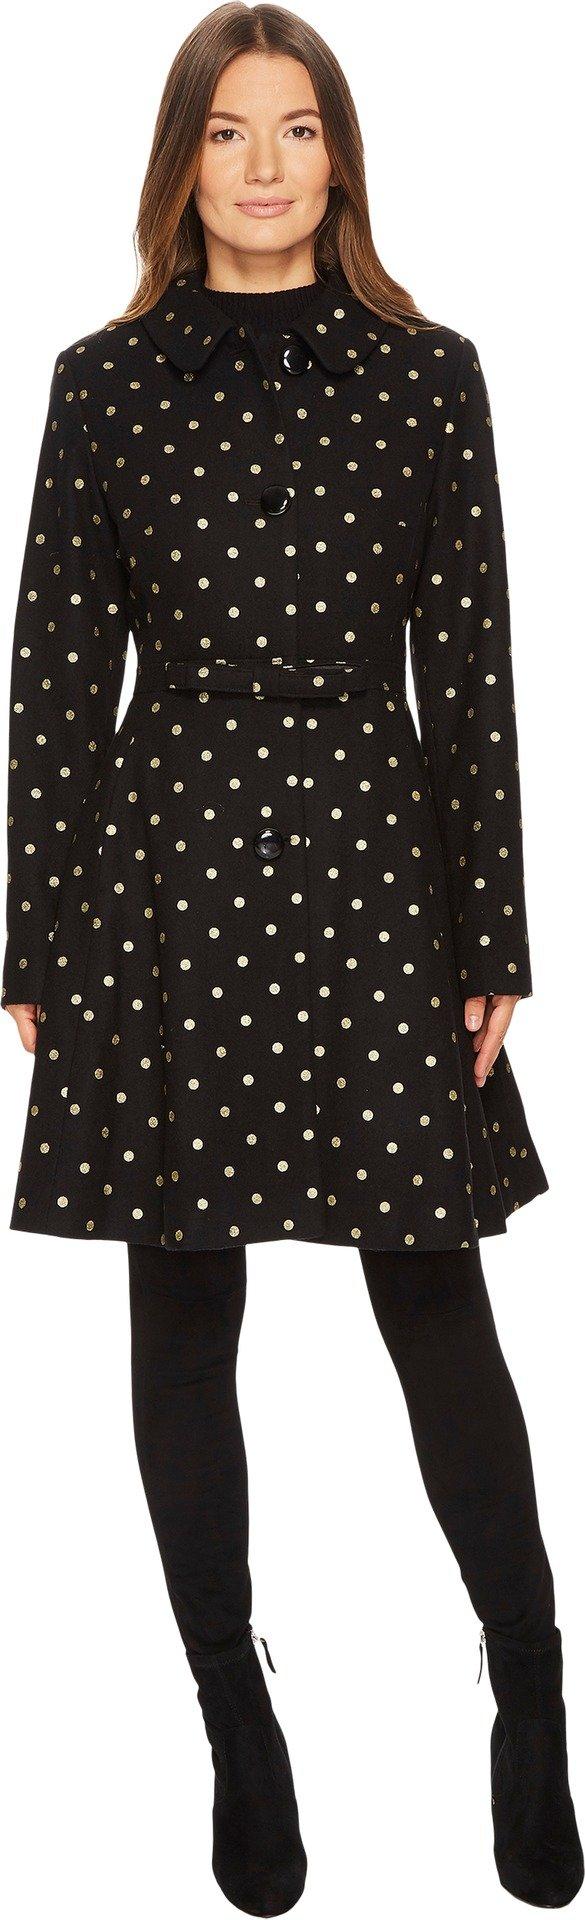 Kate Spade New York Womens Wool Novelties Glitter Polka Dot Peacoat Black Gold LG One Size